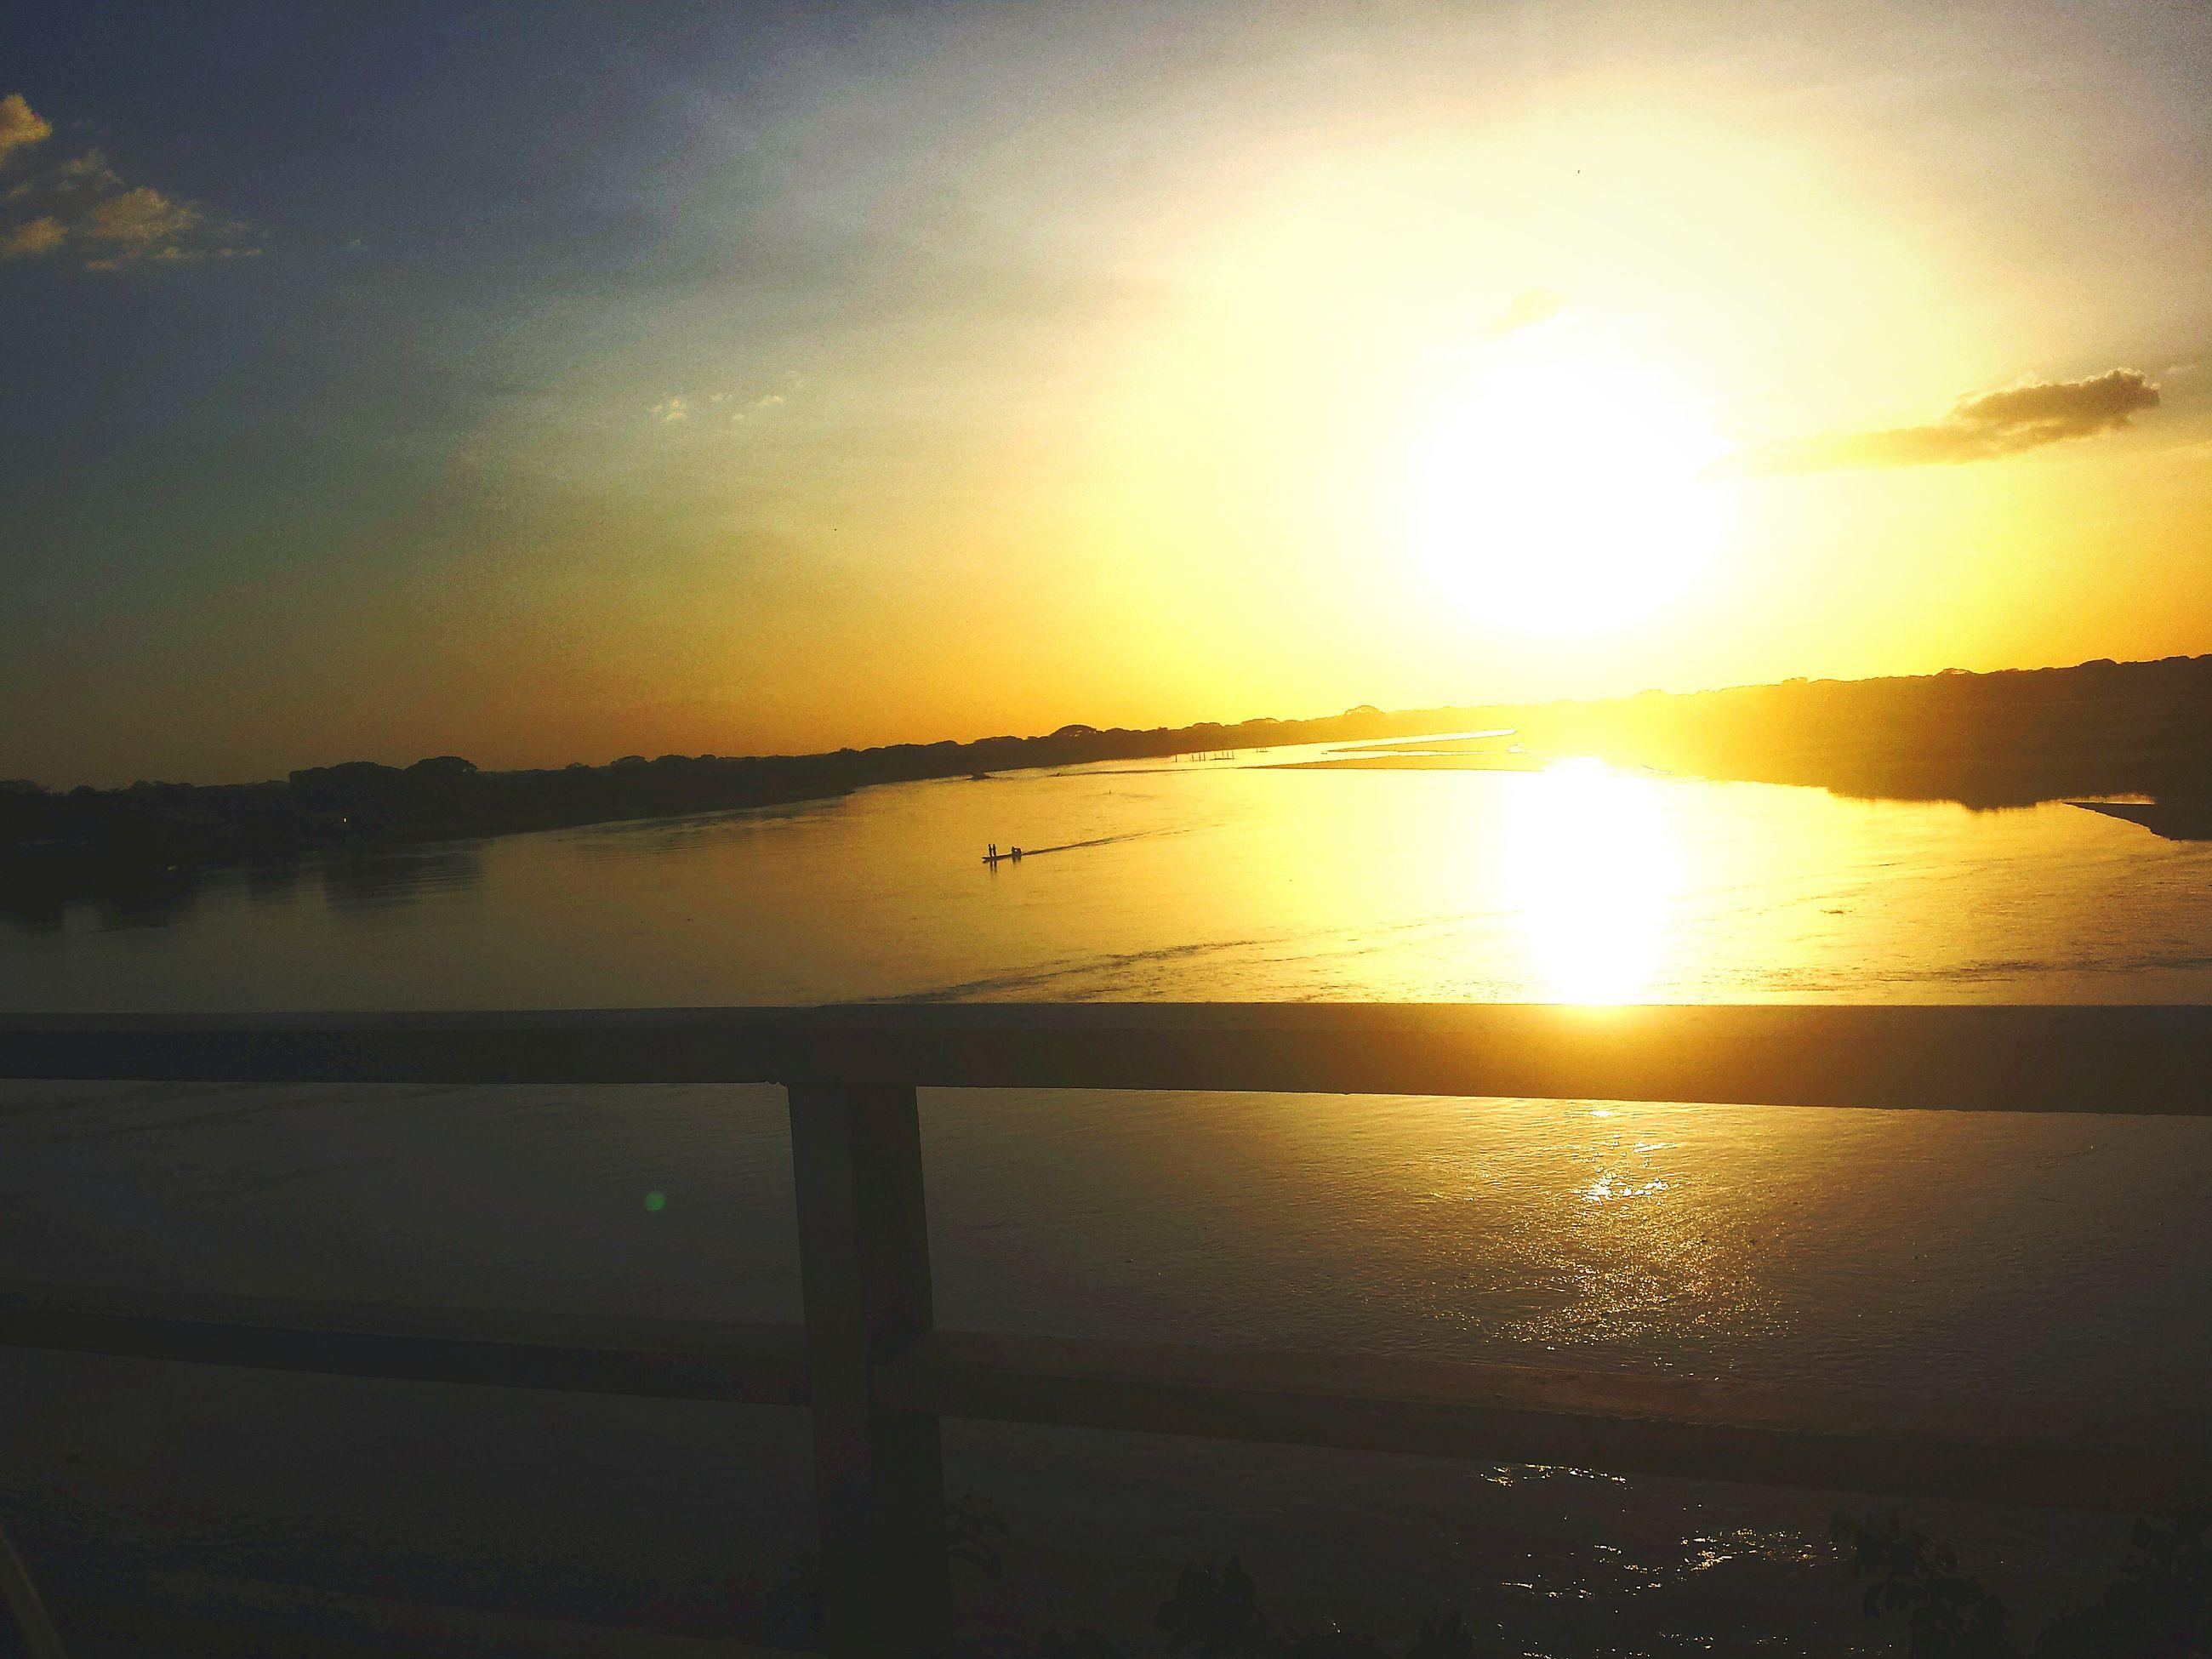 sunset, sun, water, sea, scenics, tranquil scene, reflection, tranquility, beauty in nature, horizon over water, sky, orange color, idyllic, sunlight, beach, nature, shore, silhouette, sunbeam, lake